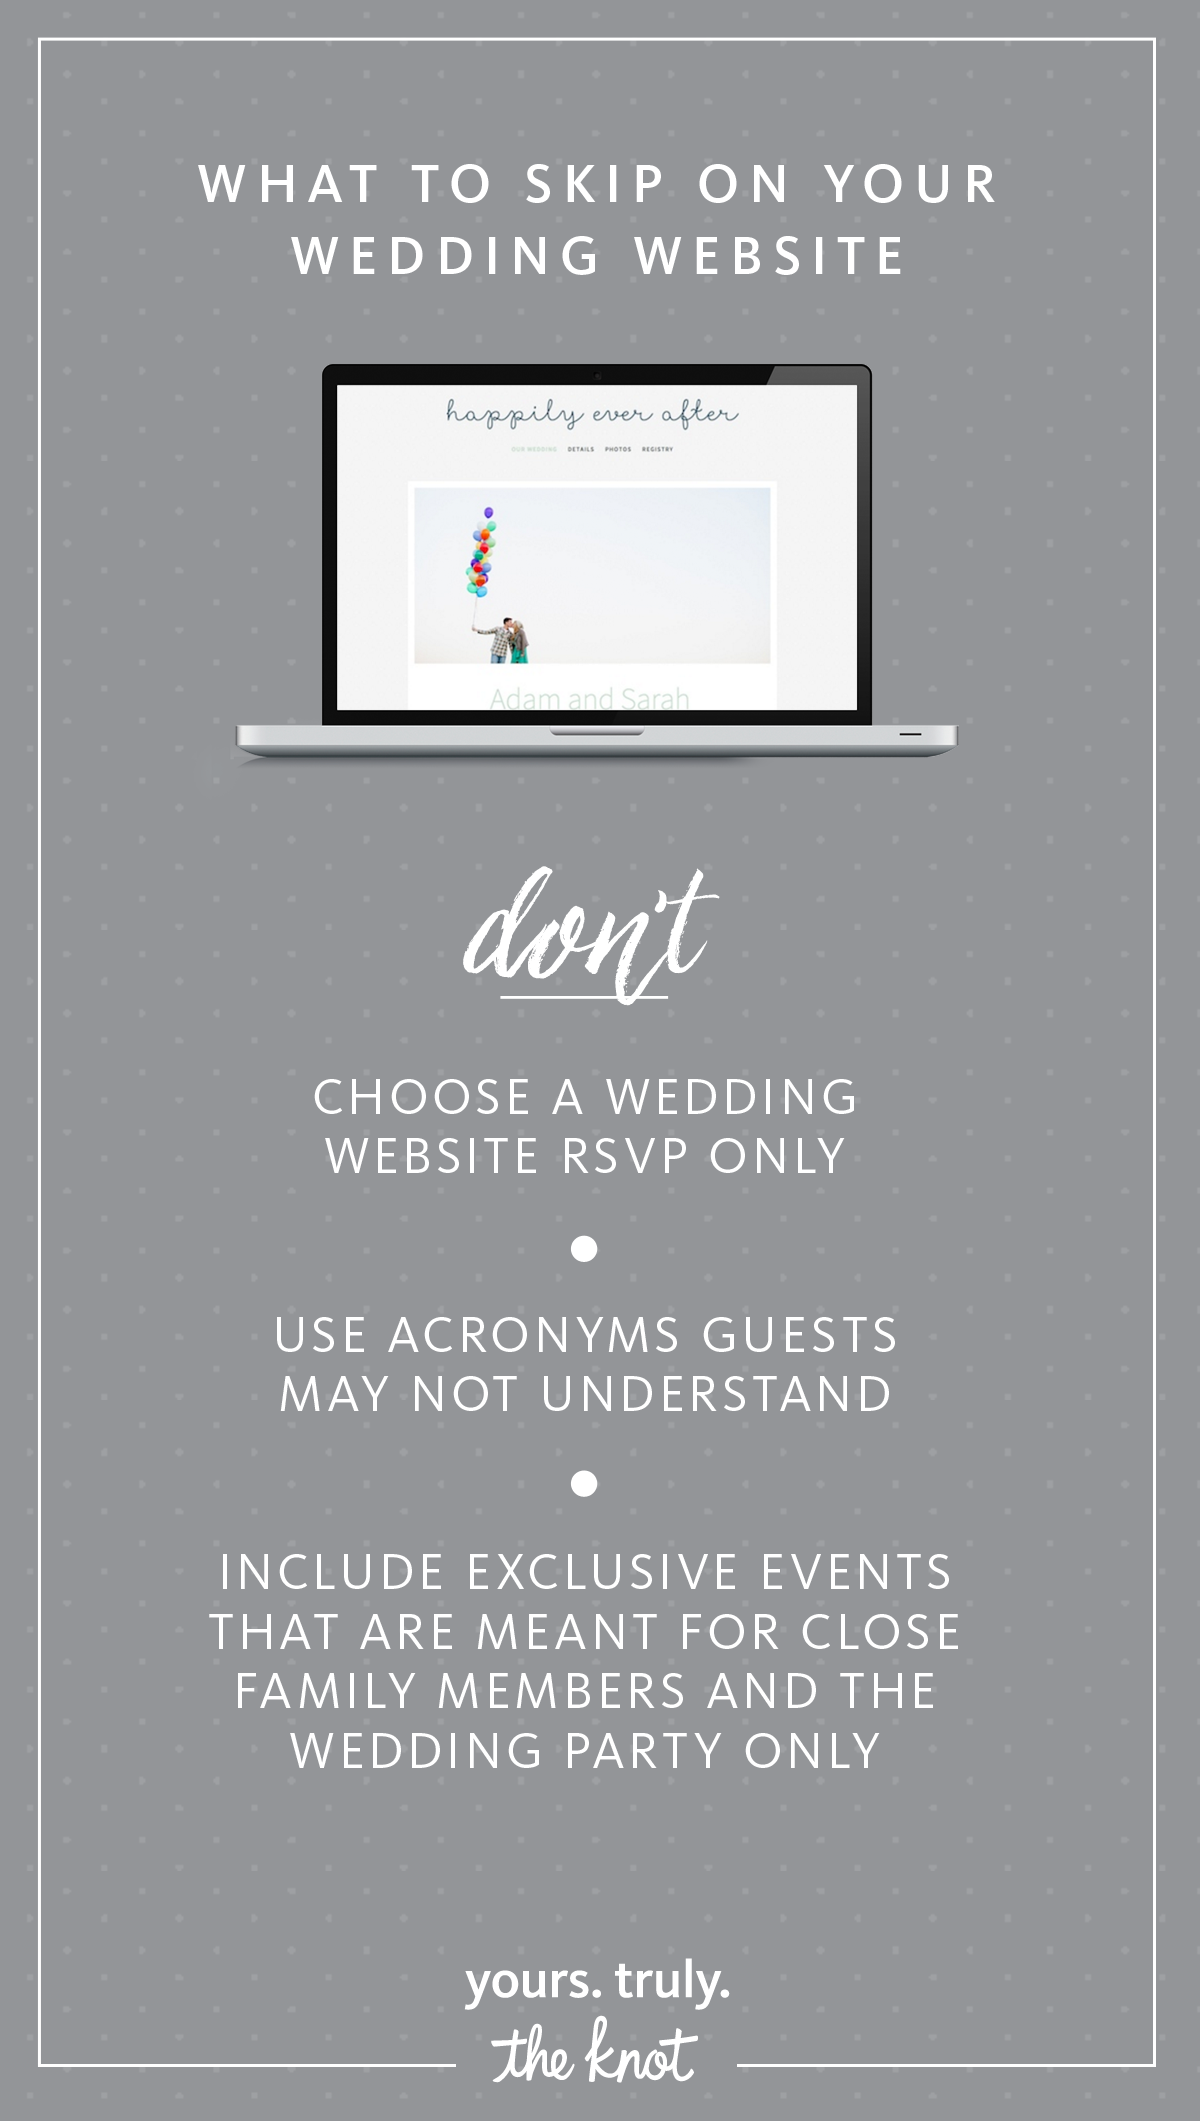 7 Wedding Website Dos and Don'ts Wedding website